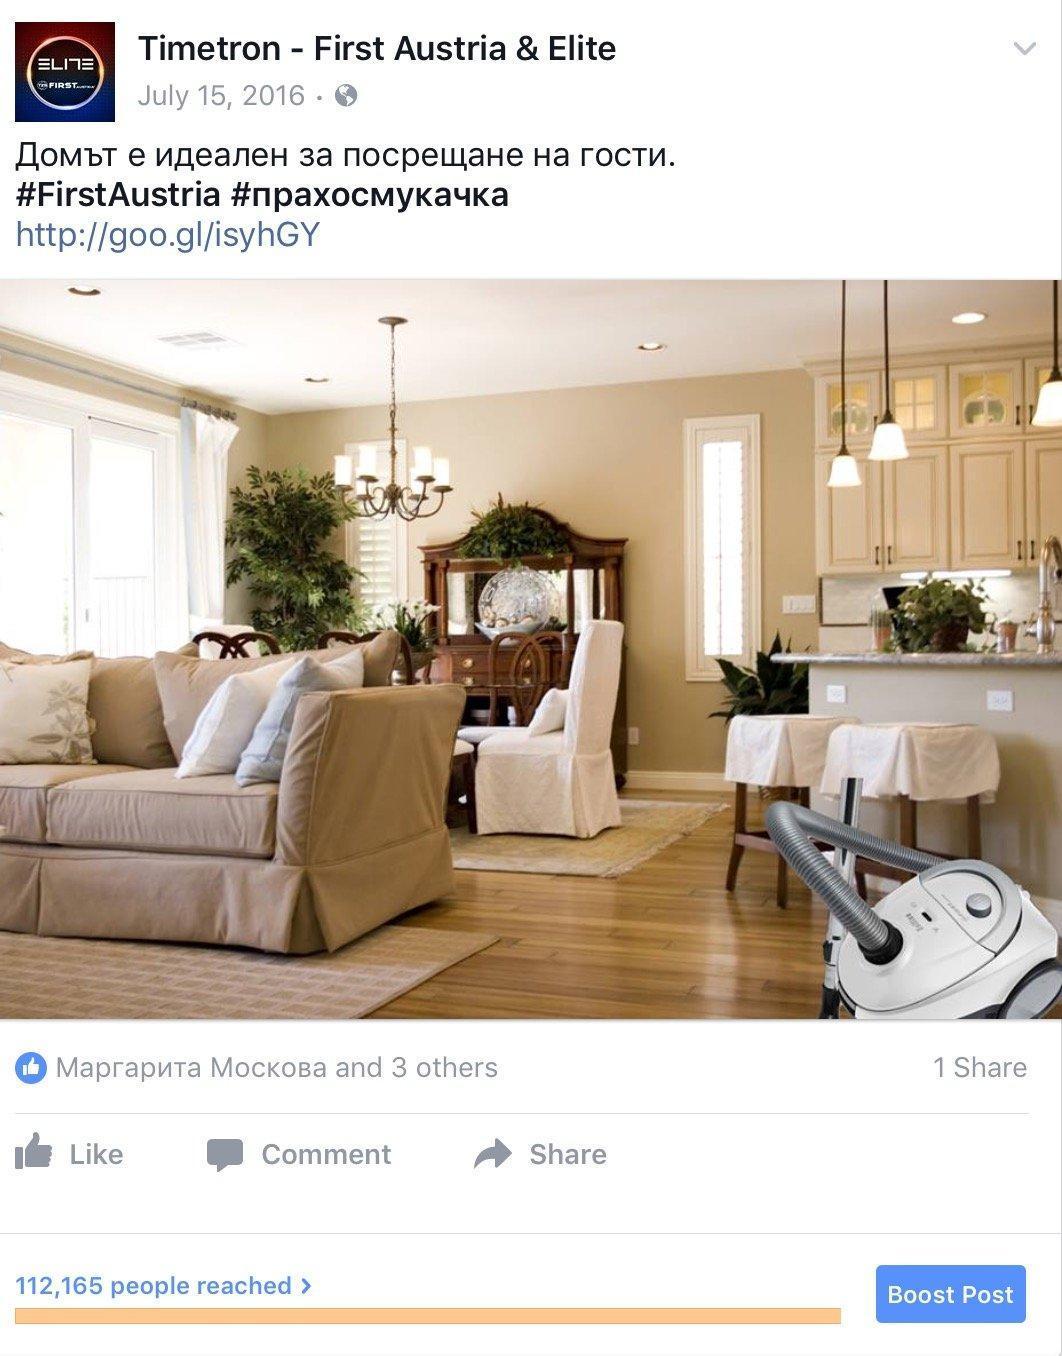 CarpeDiem- Timetron Facebook Marketing (1)